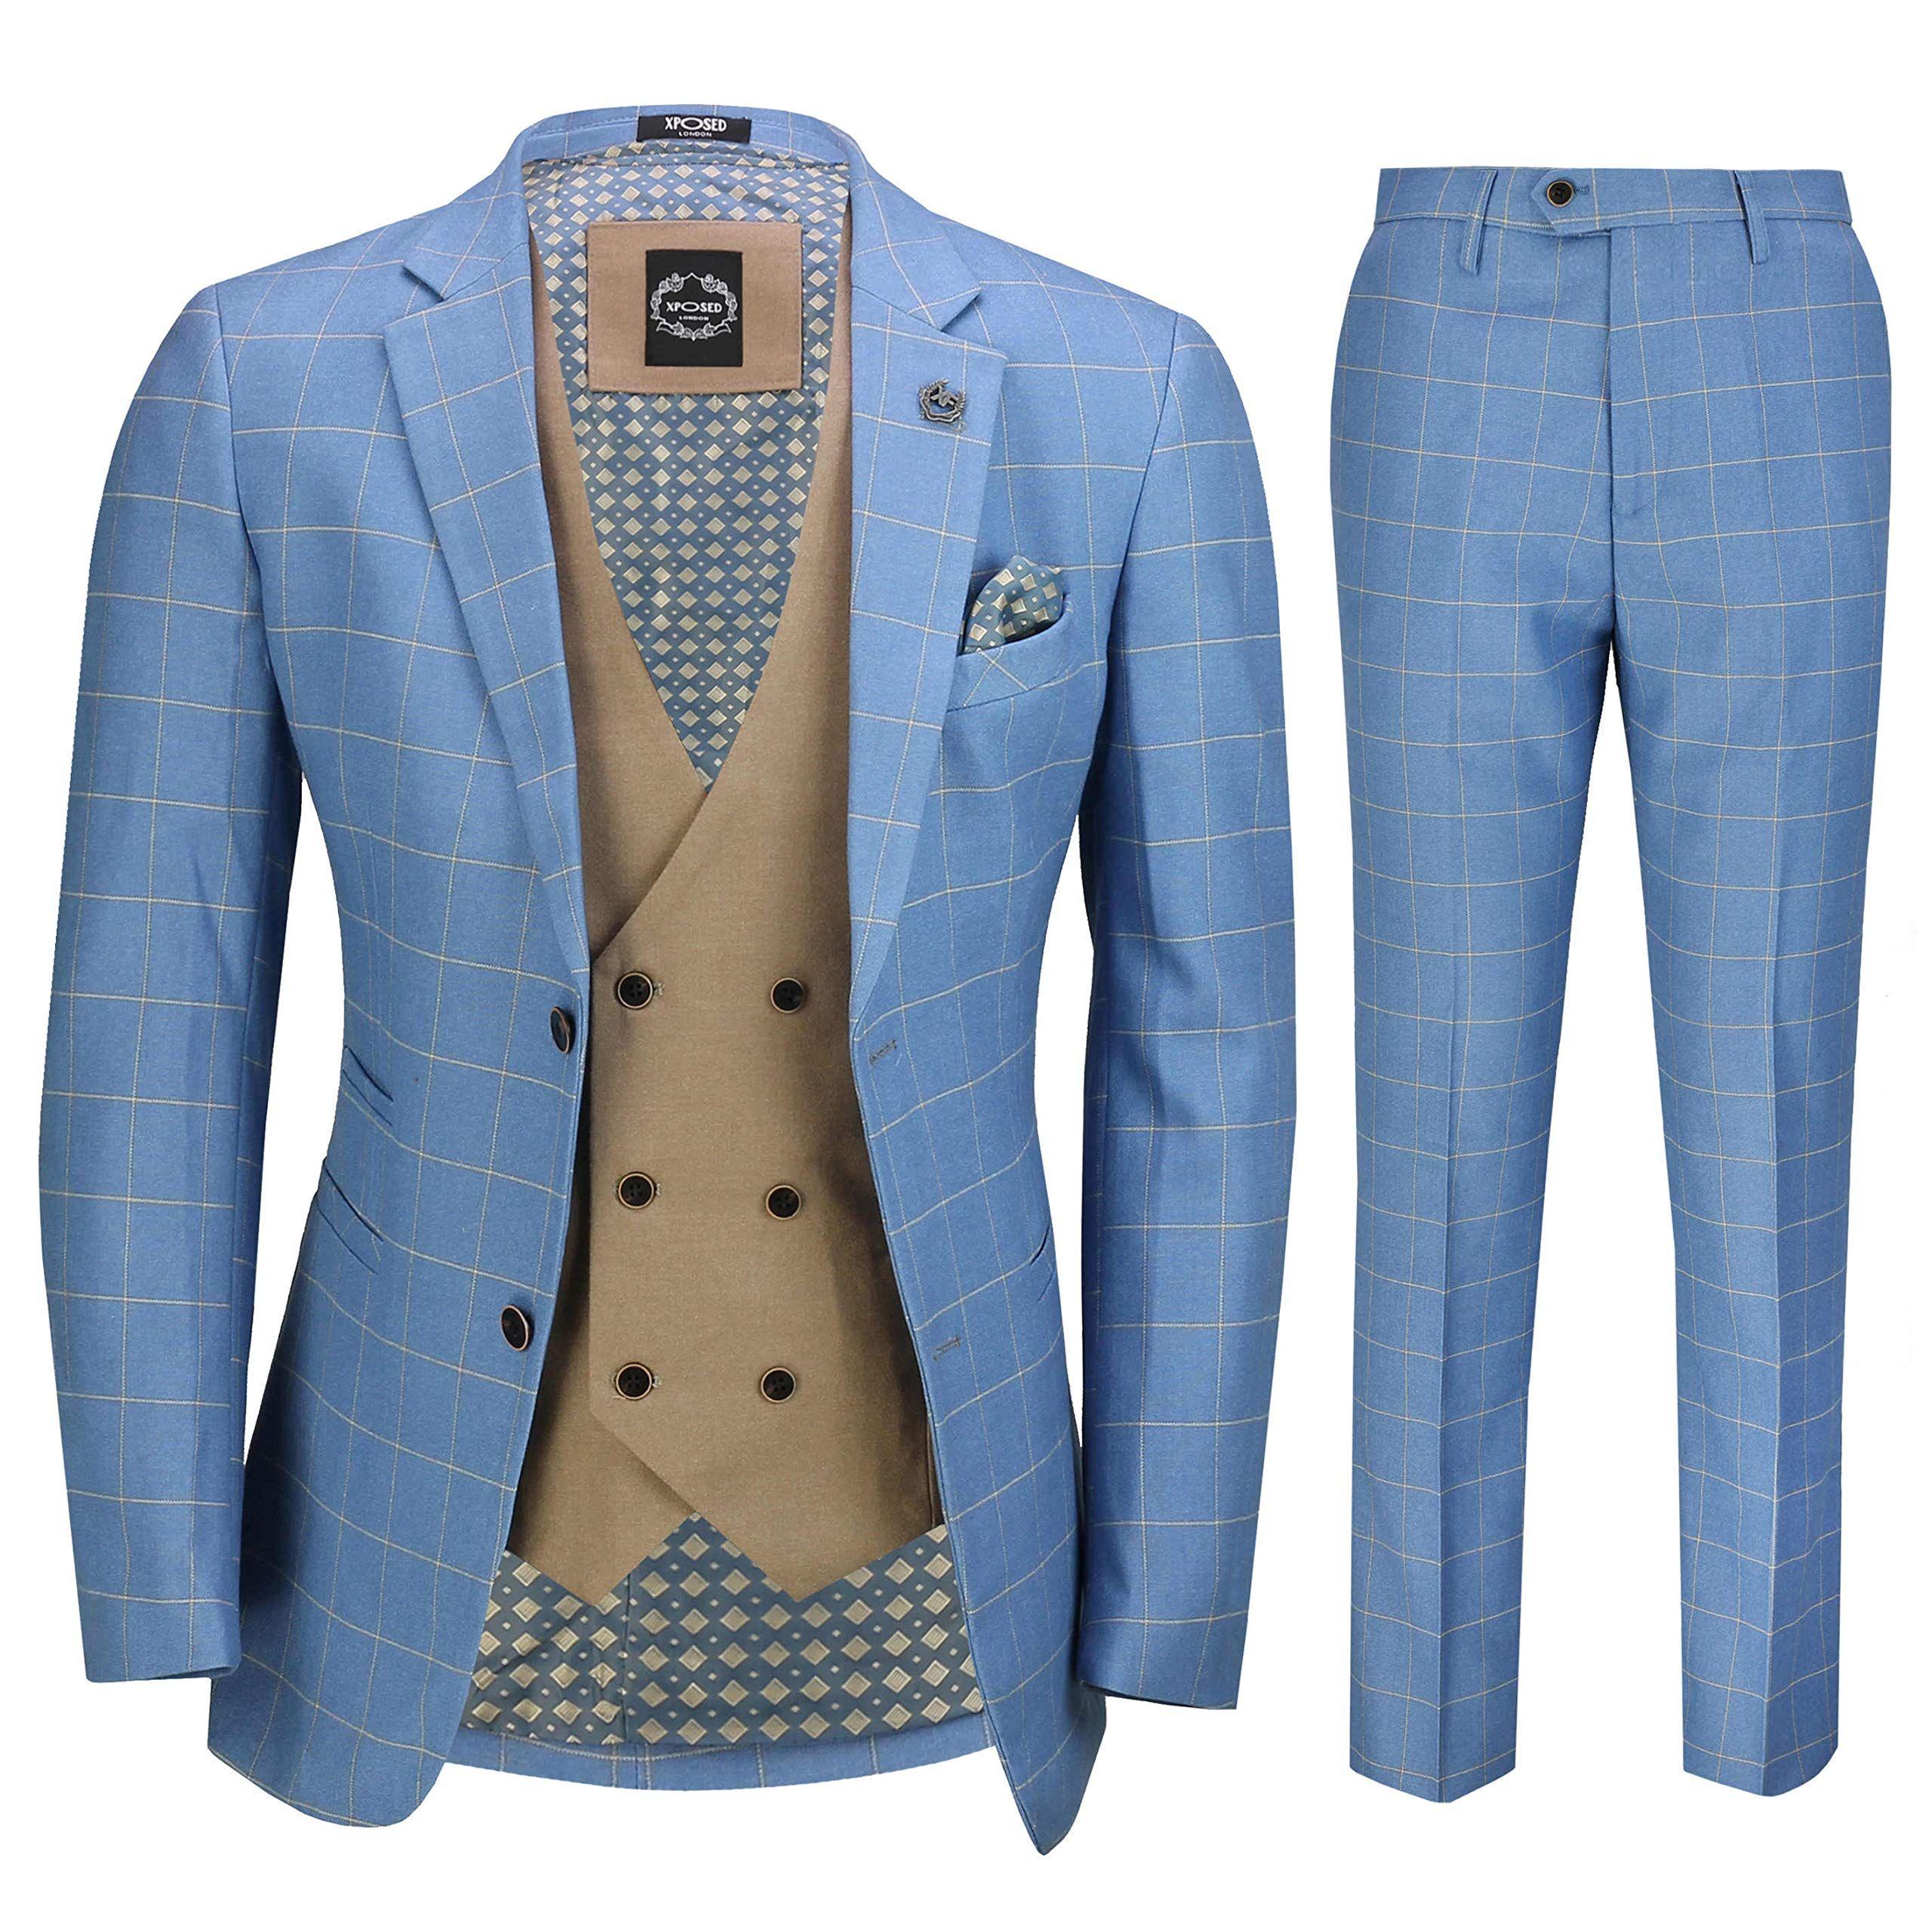 Xposed Herren 3 Stück Sky Blau Windowpane Karierte Anzug